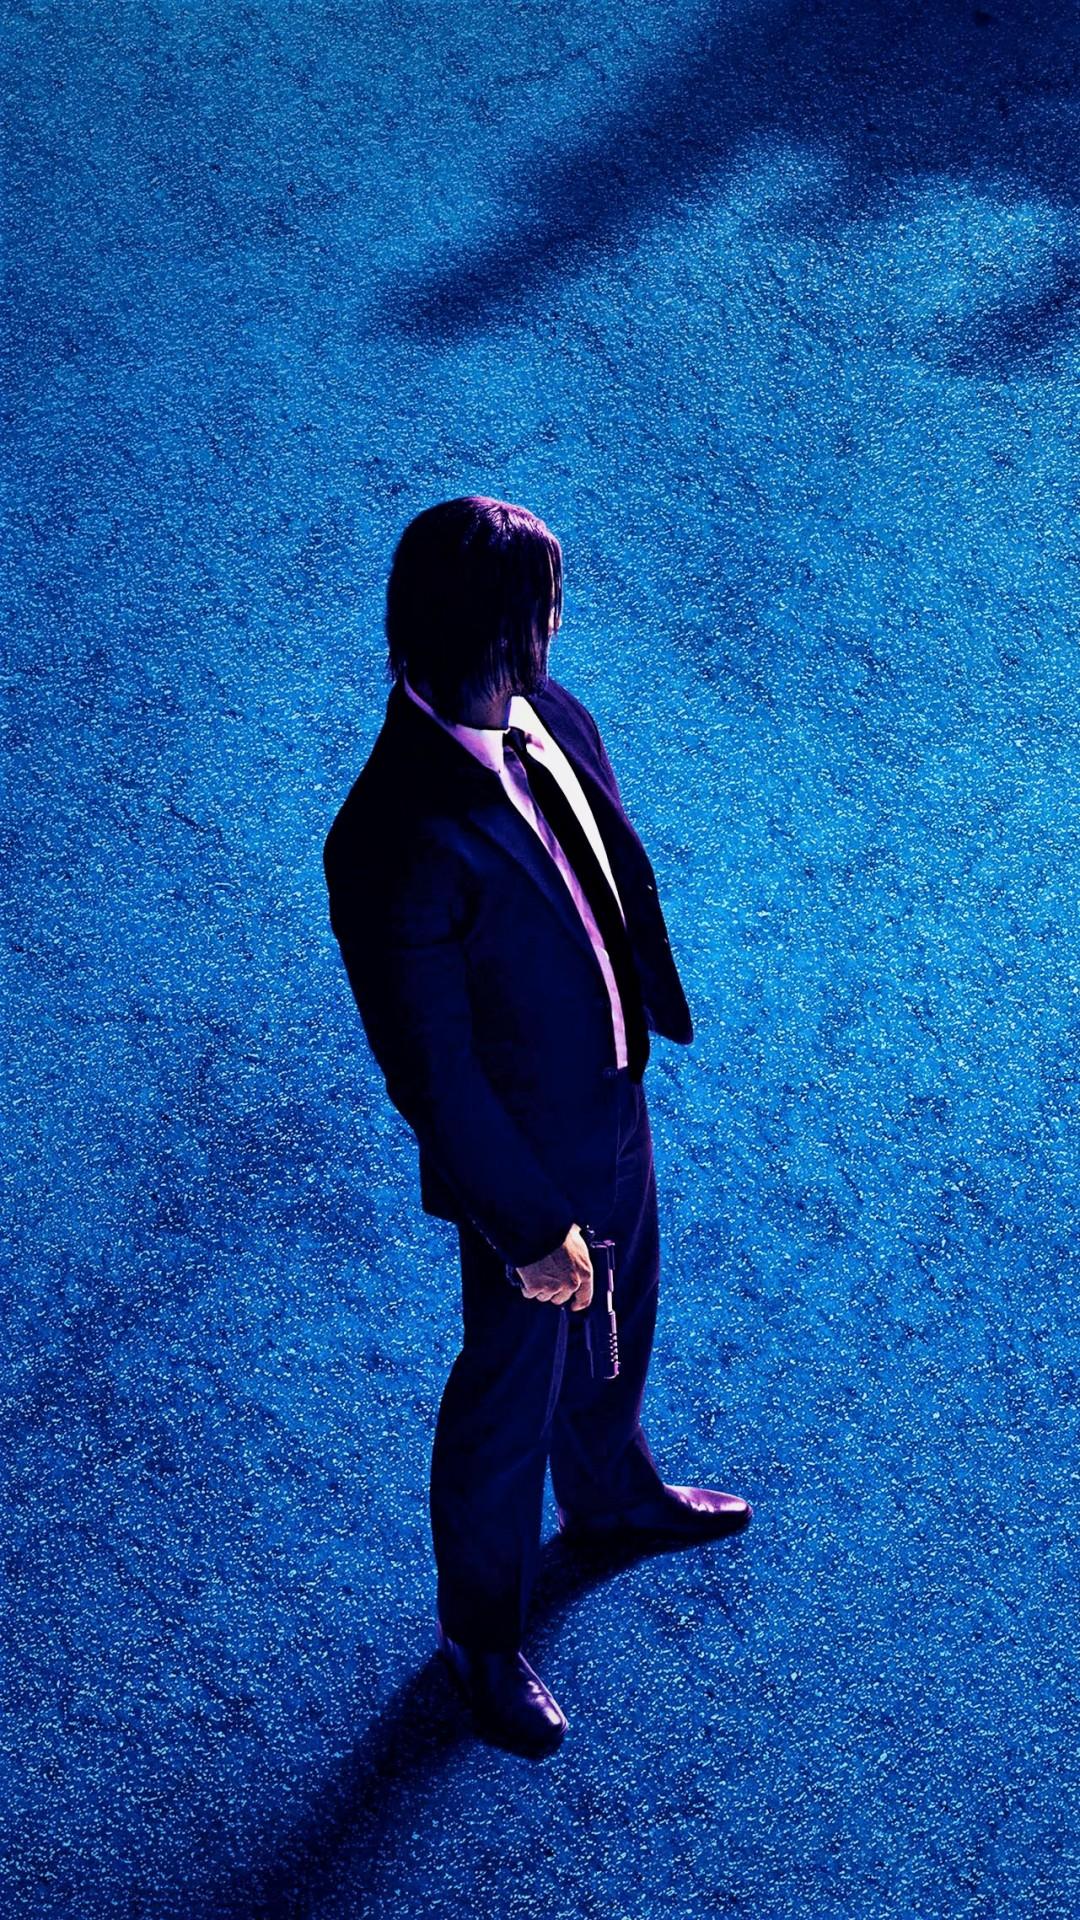 Wallpaper John Wick 3 Parabellum Keanu Reeves 4k Movies